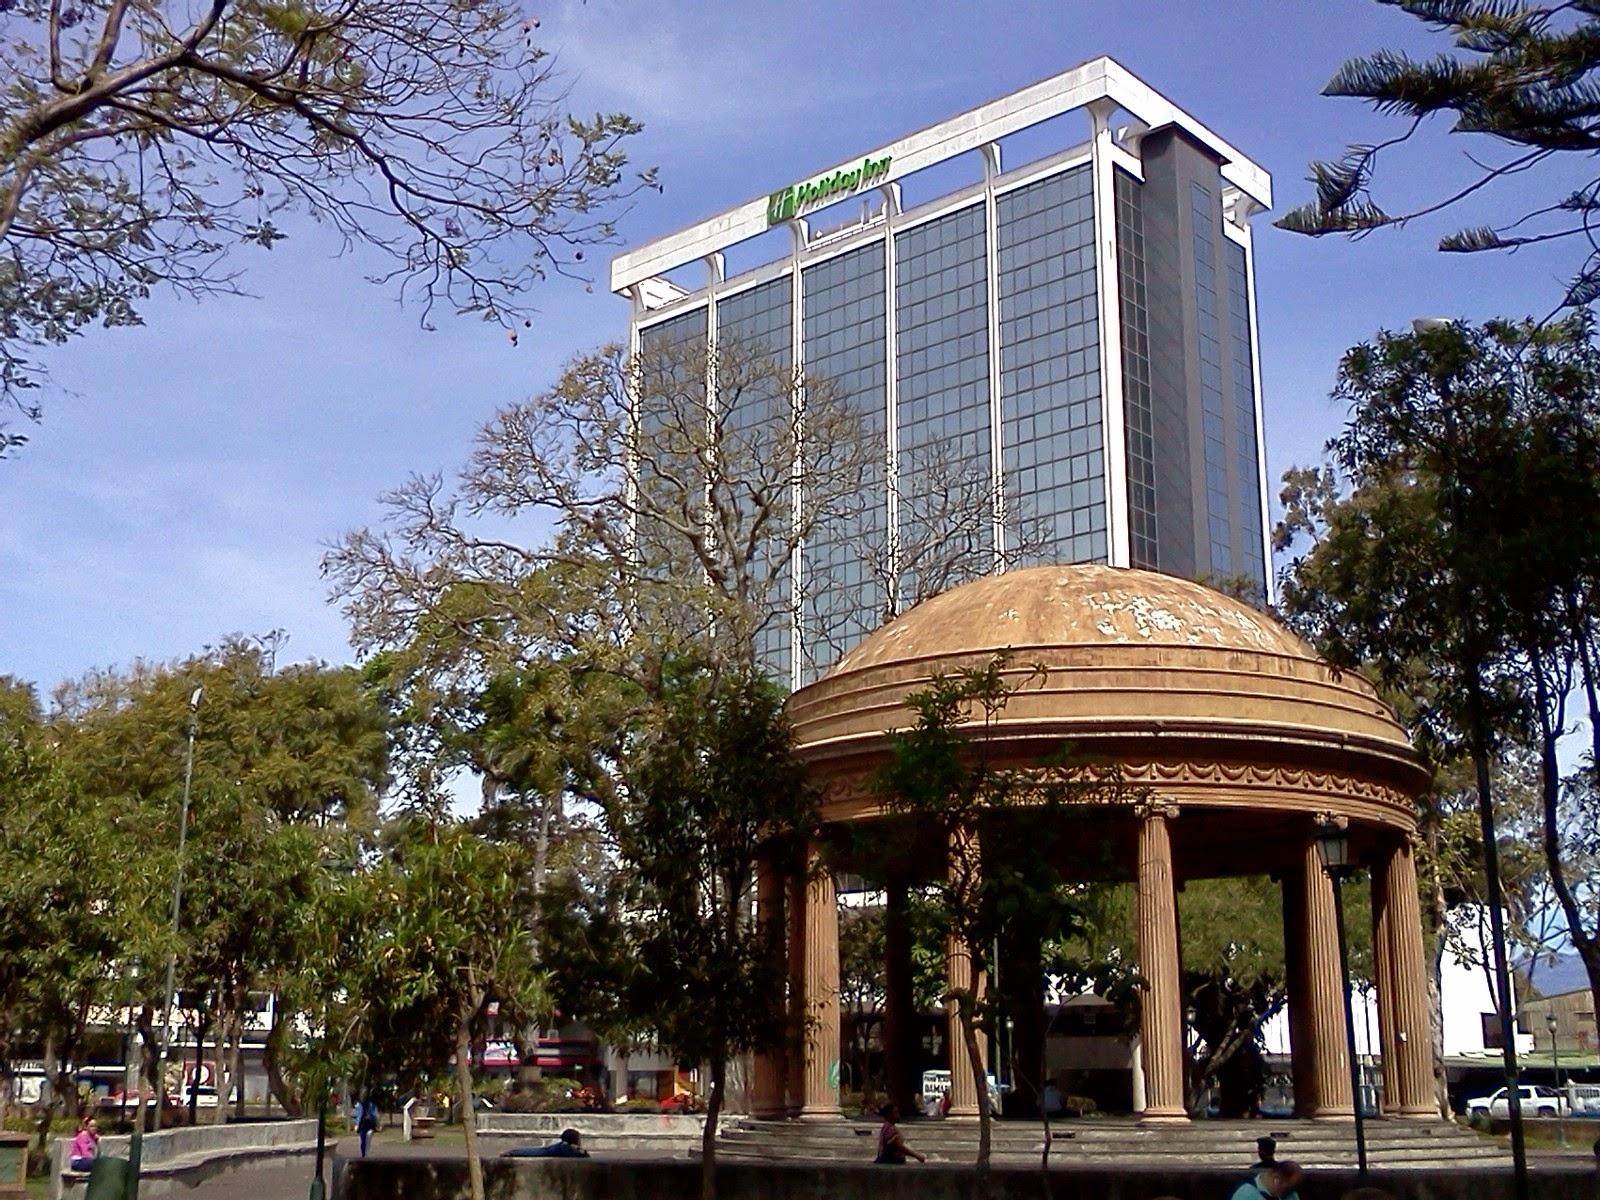 銀髮背包客中南美 Central and South America: 哥斯達黎加 Costa Rica 聖何塞 San Jose - 景觀與氣侯